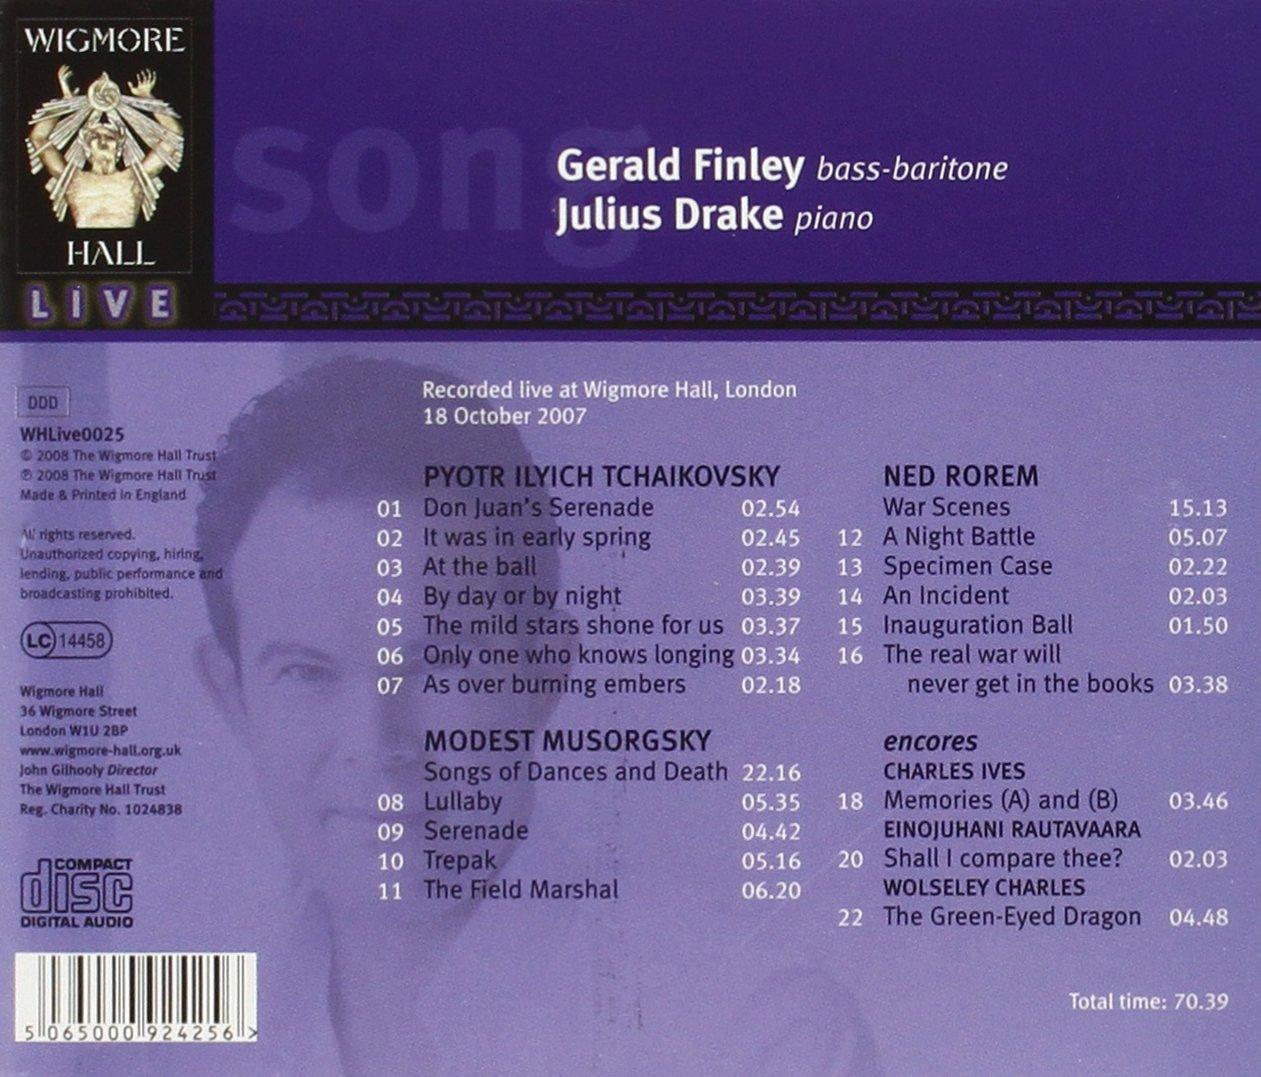 Songs by Tchaikovsky, Mussorgsky & Ned Rorem